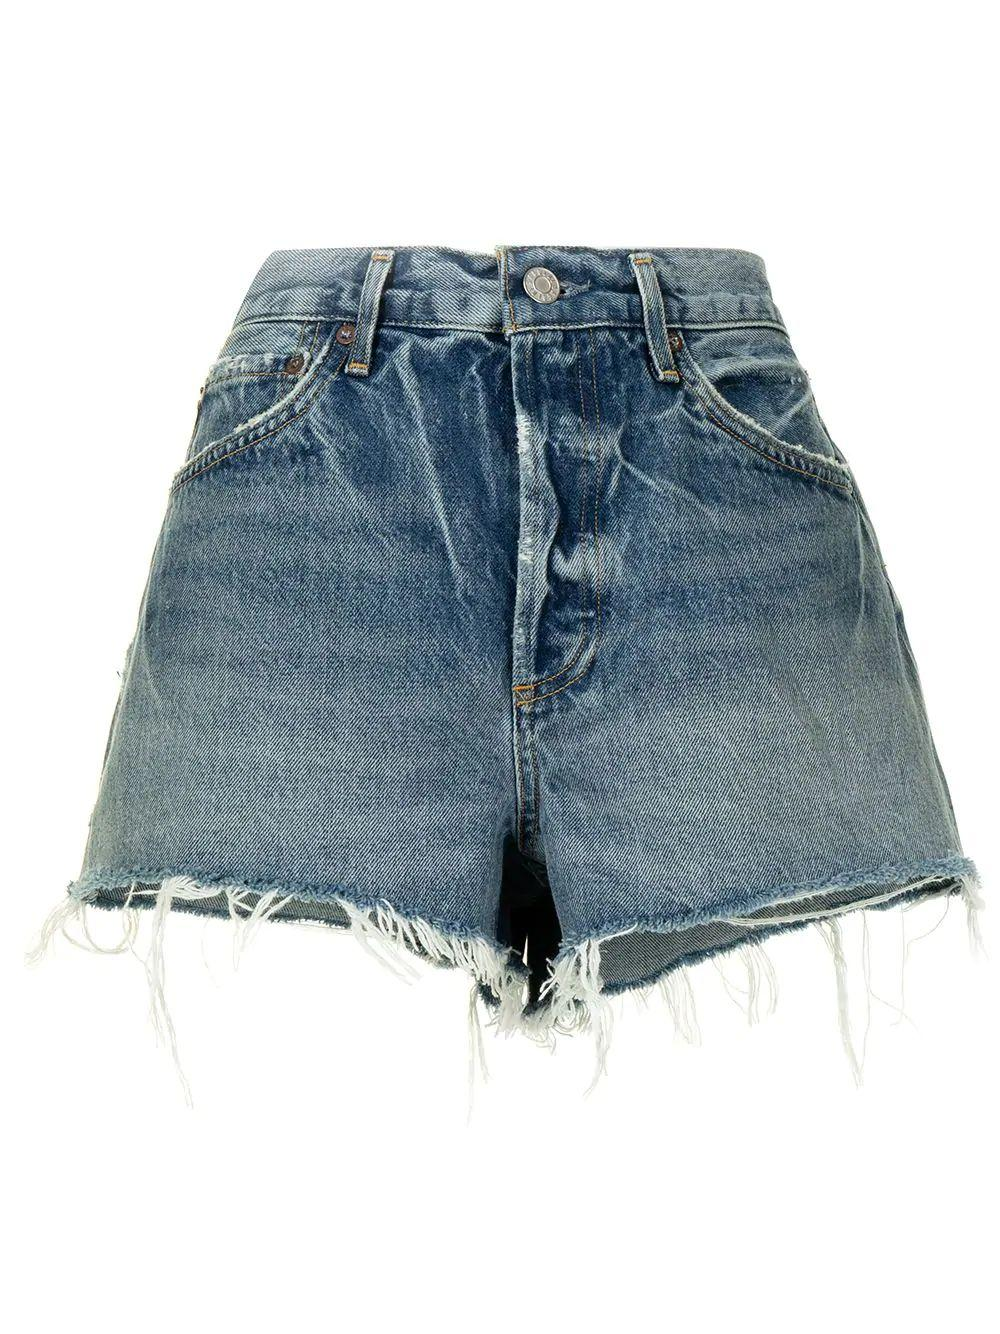 Parker Denim Shorts Item # A026-1206